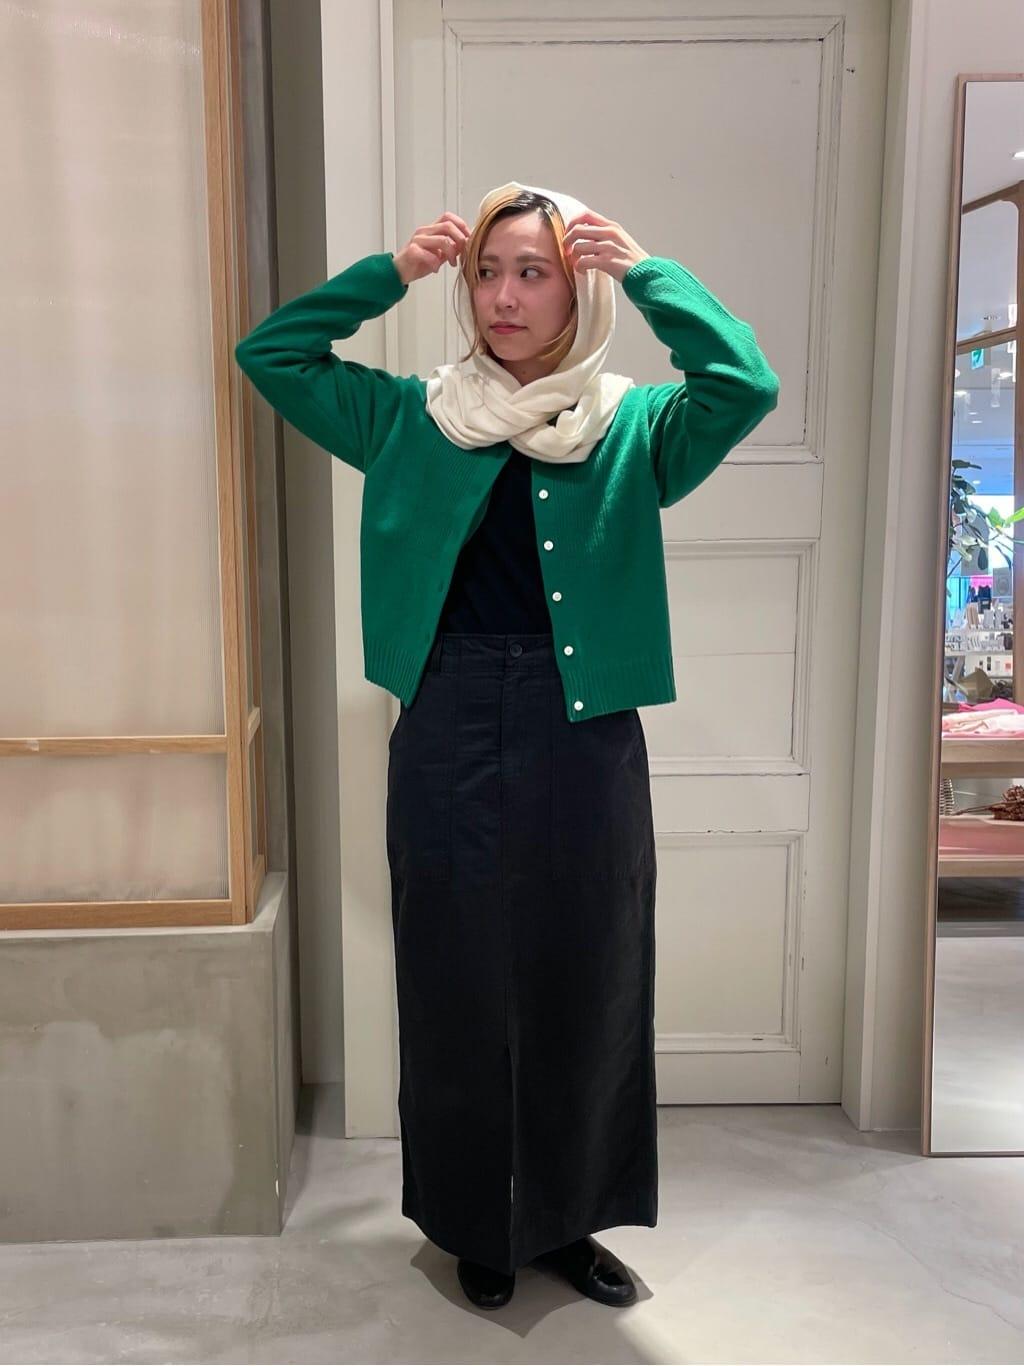 bulle de savon 渋谷スクランブルスクエア 身長:154cm 2021.09.11